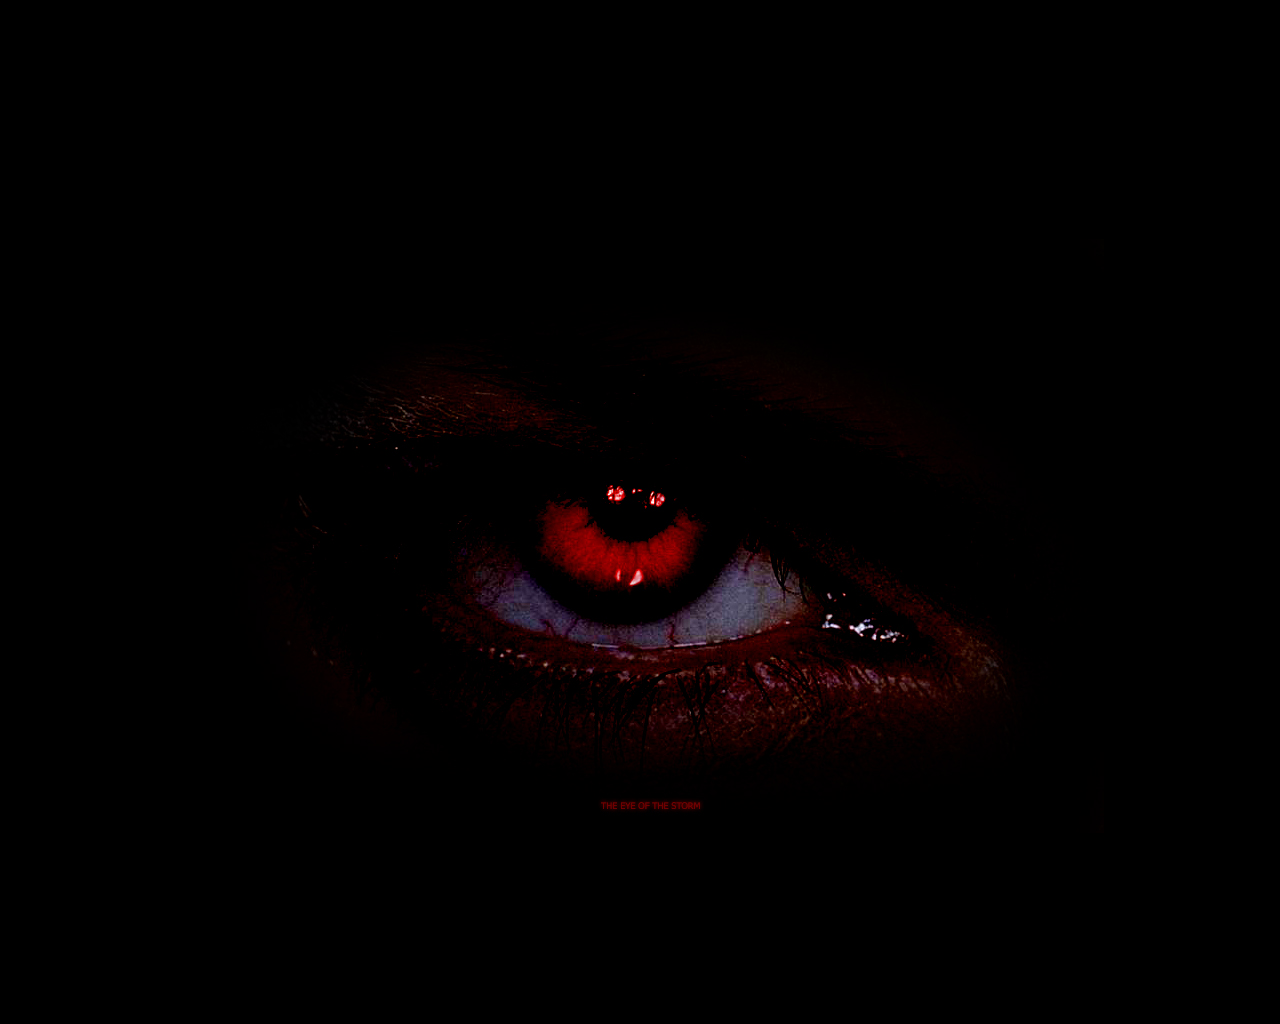 dark inside demon eye quotevcom - HD1280×1024